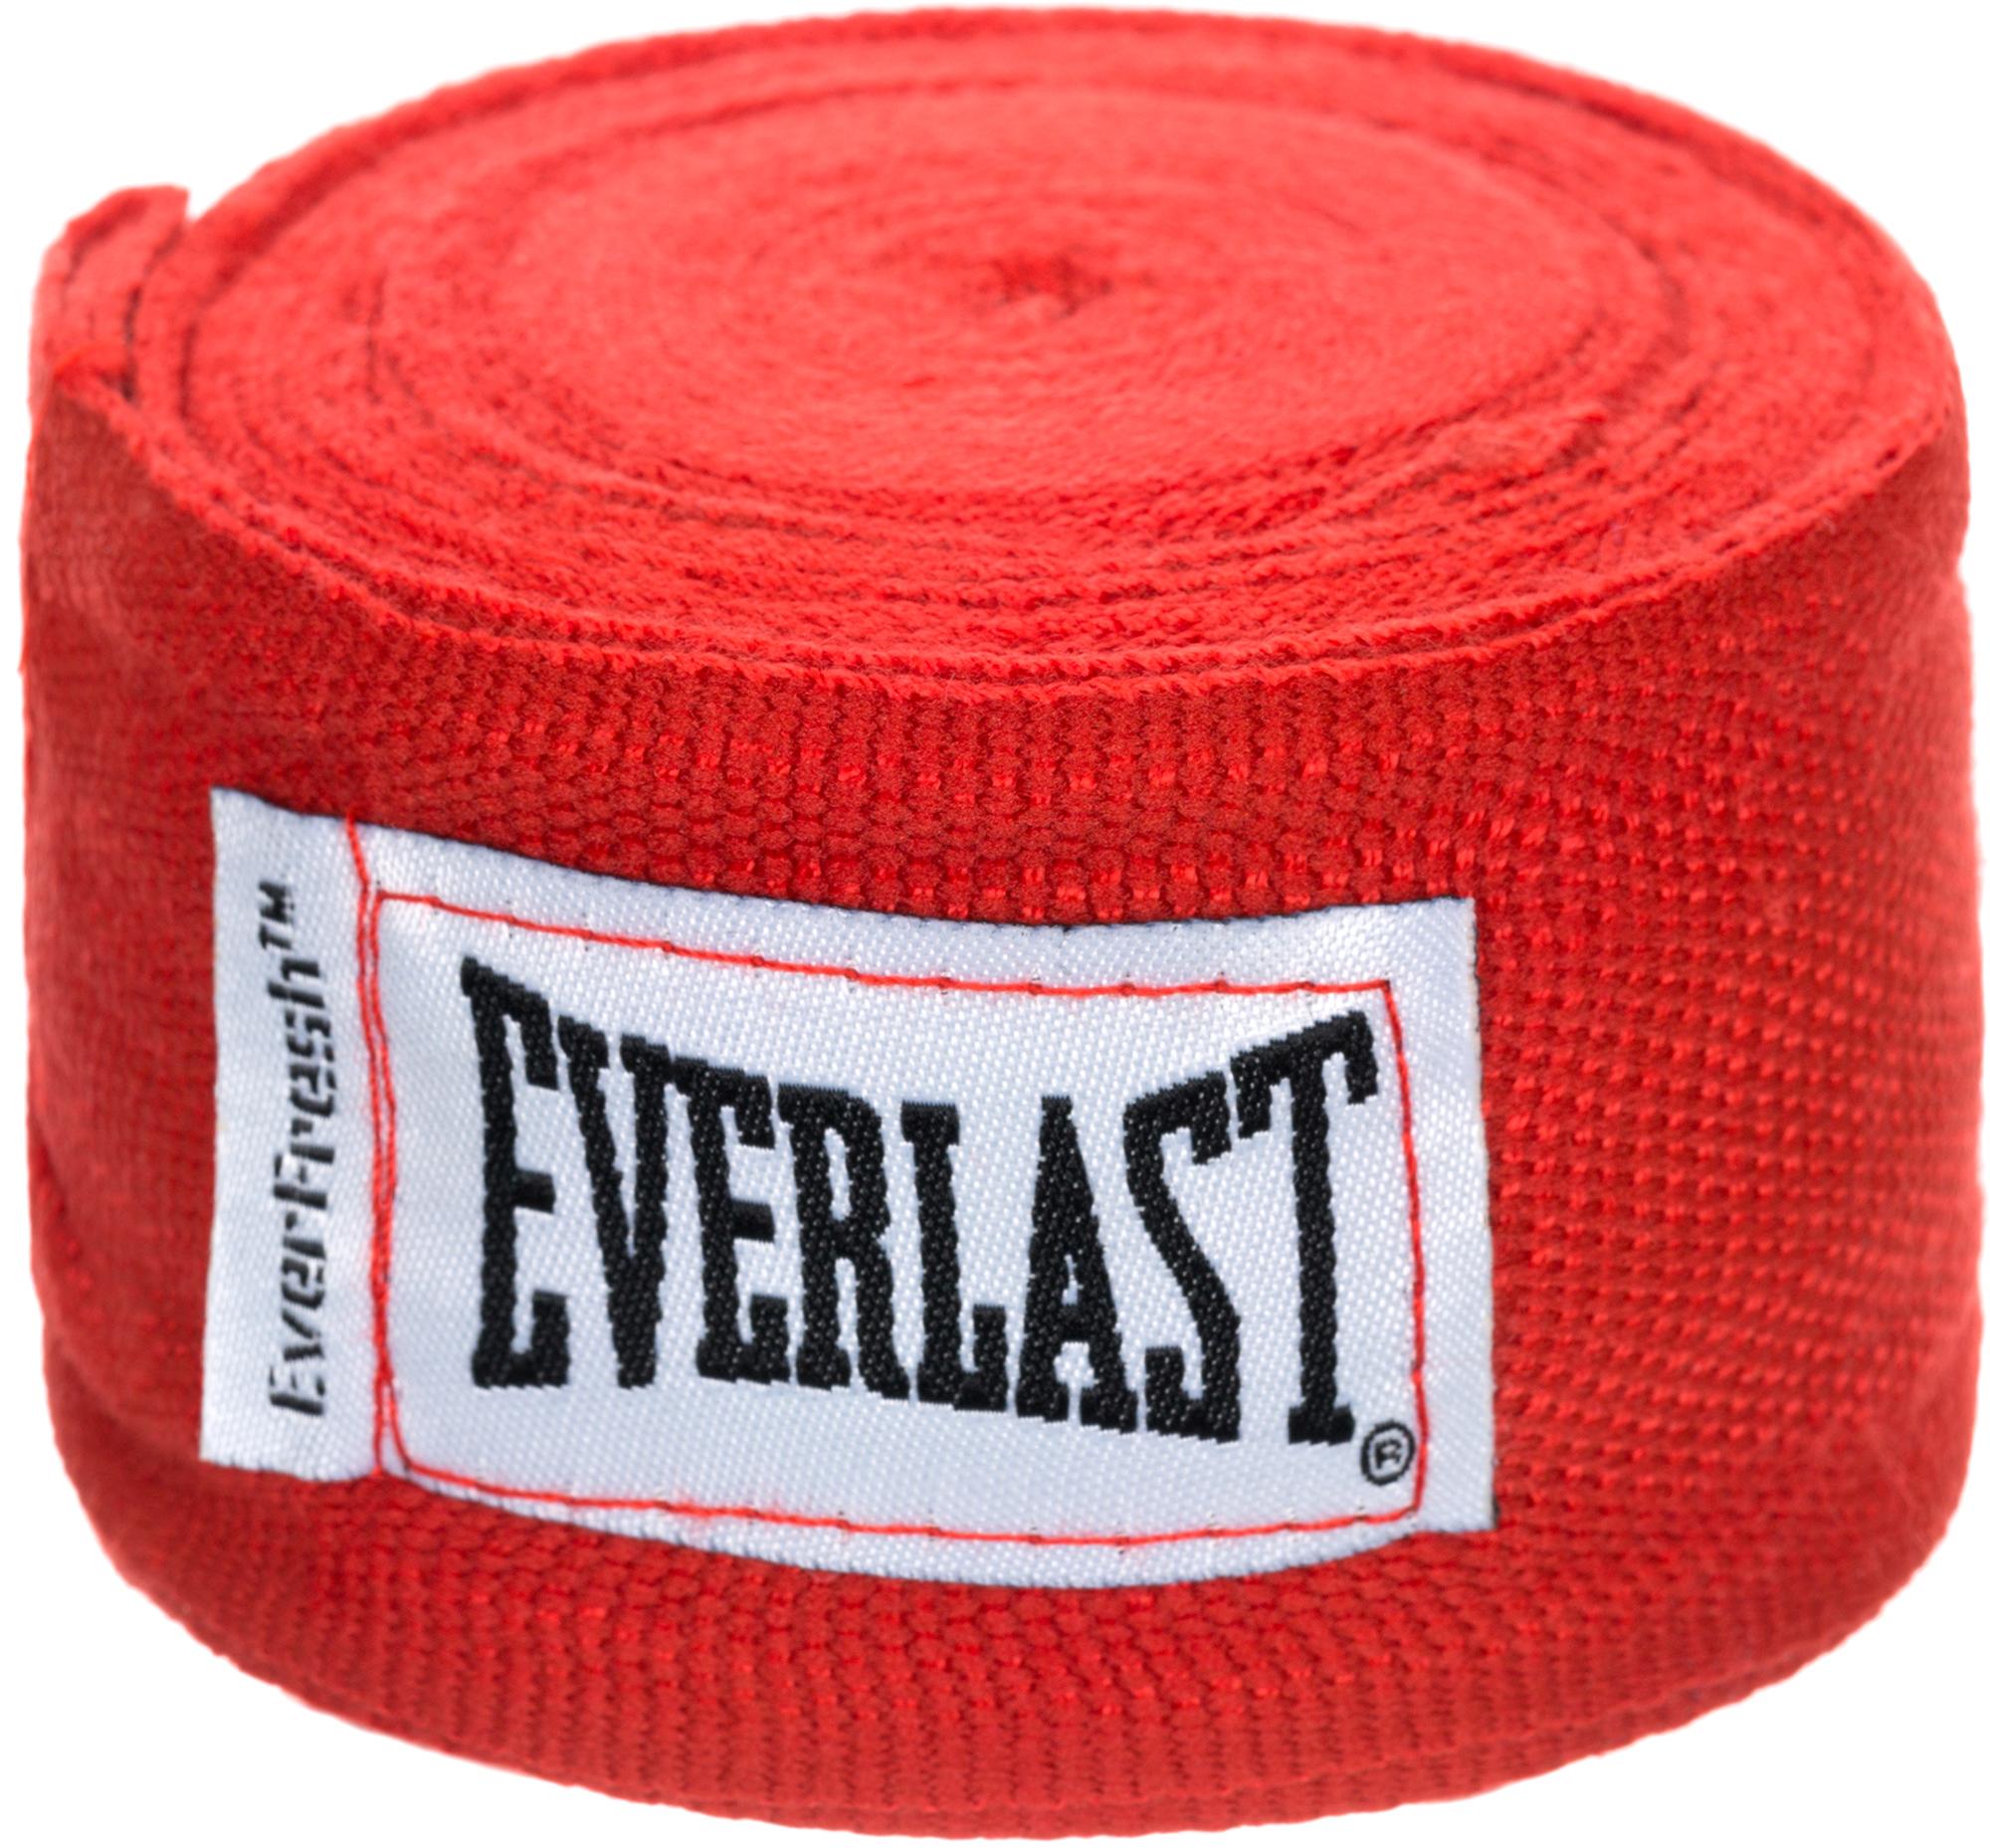 купить Everlast Бинты Everlast 3,5 м, 2 шт. дешево